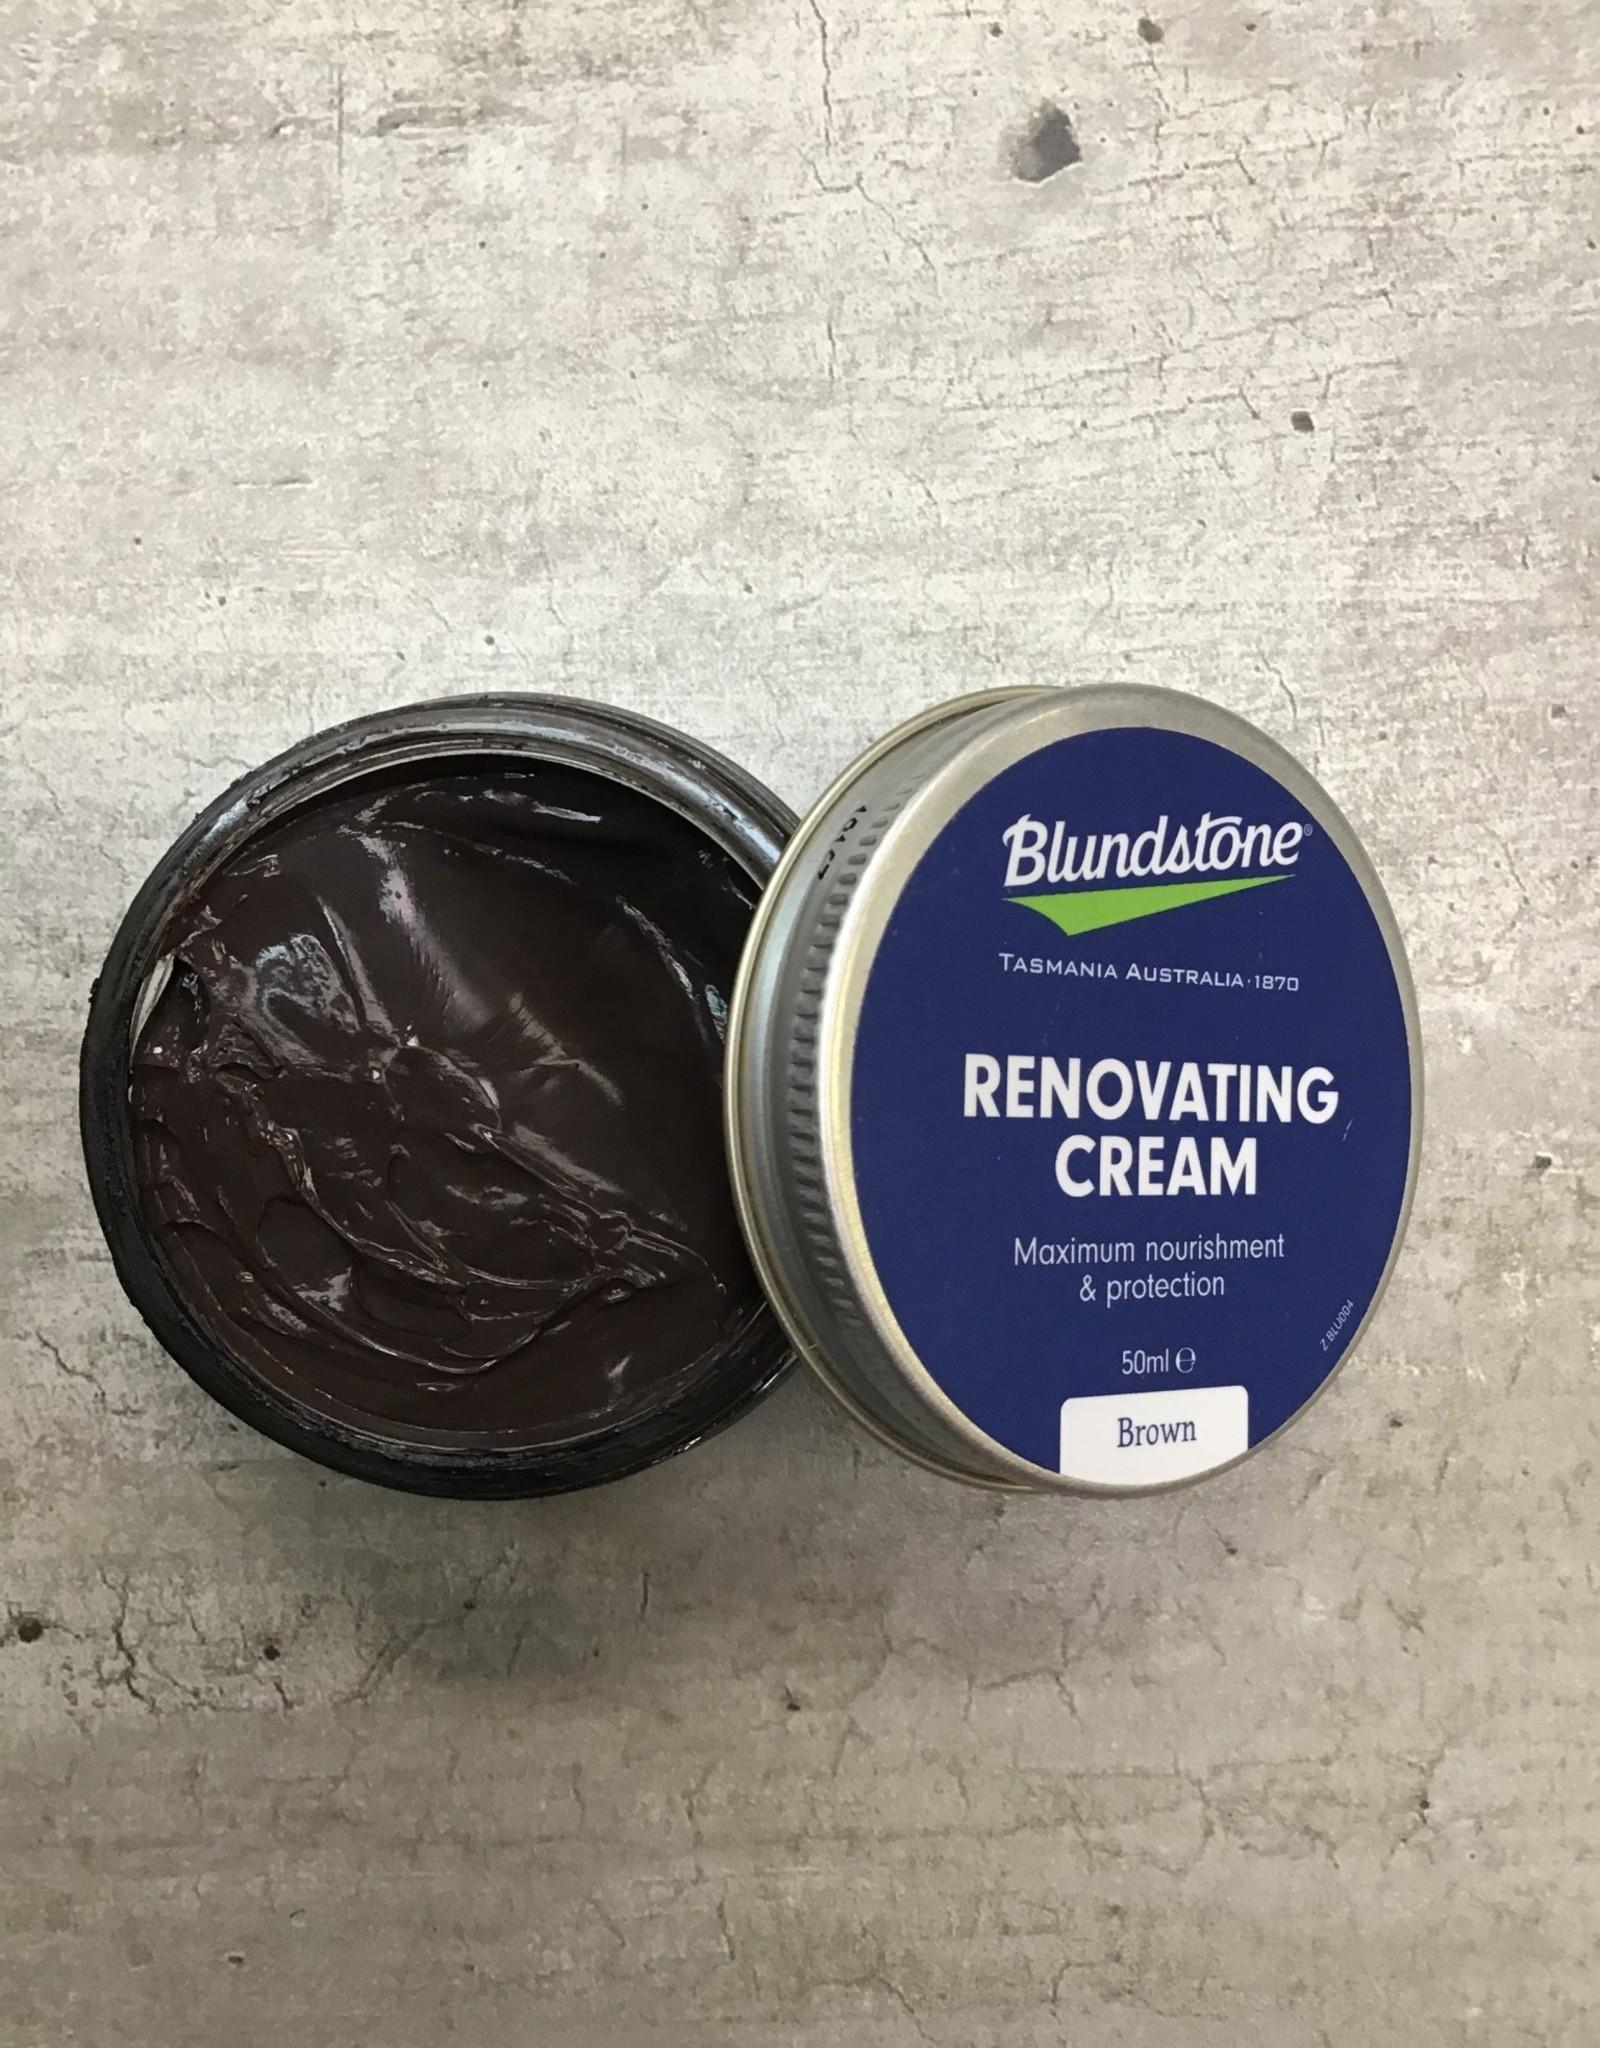 Blundstone Blundstone Renovating Cream